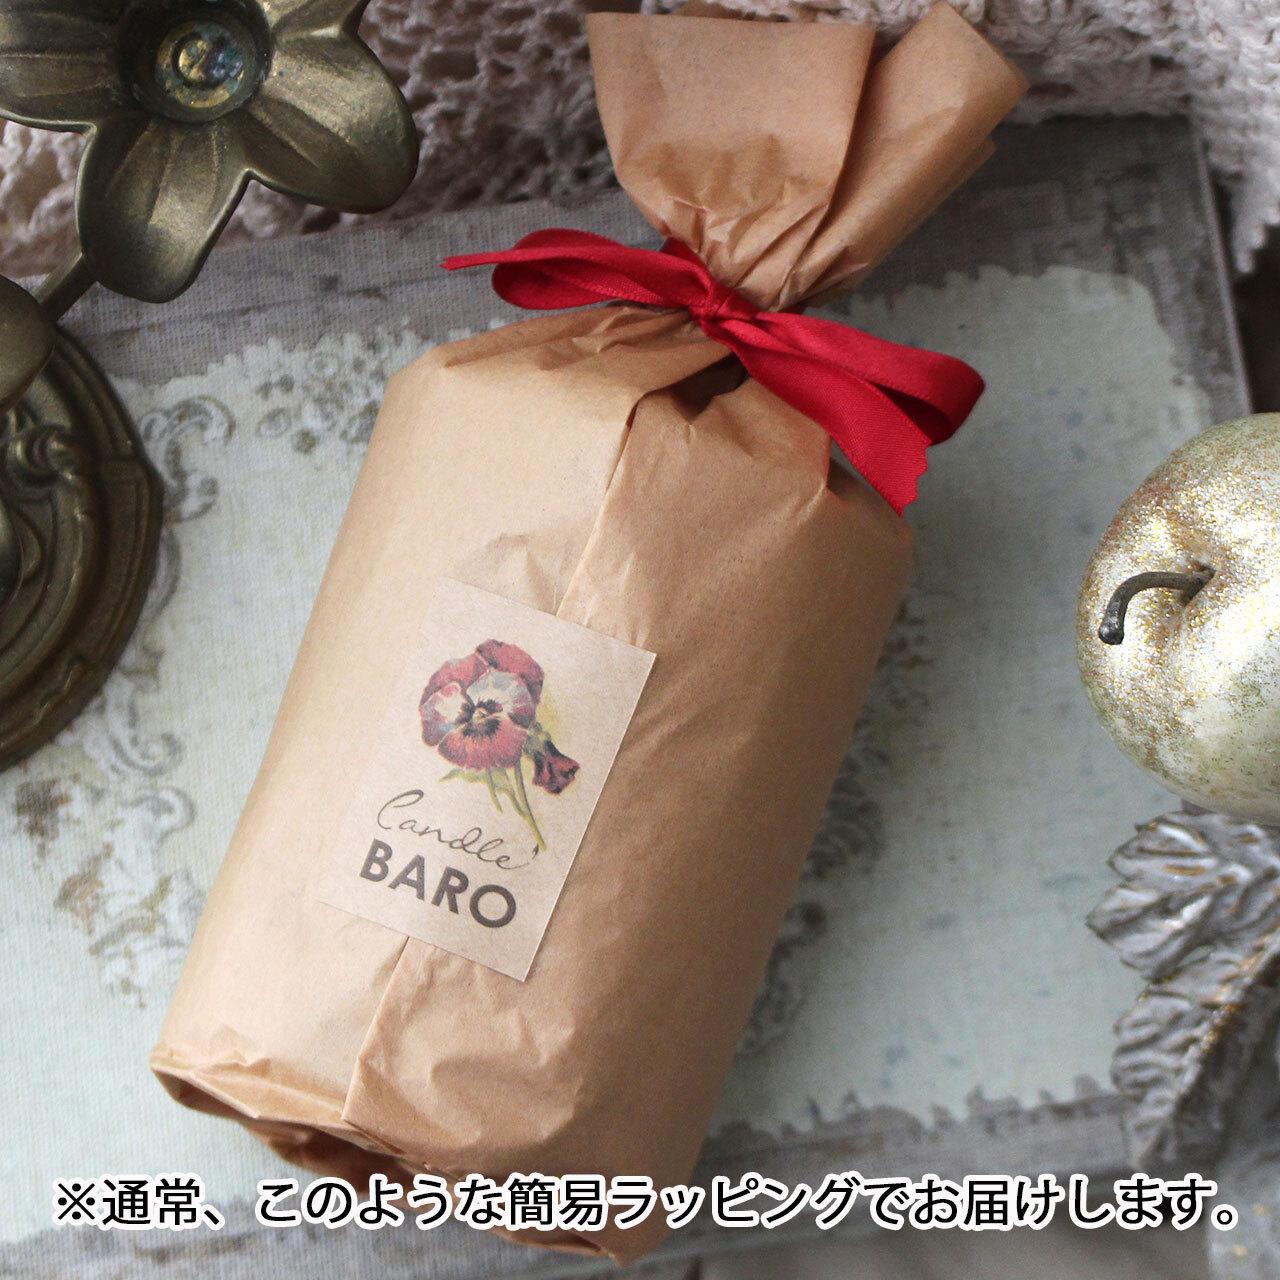 【UROCO】ピラーキャンドル UP002